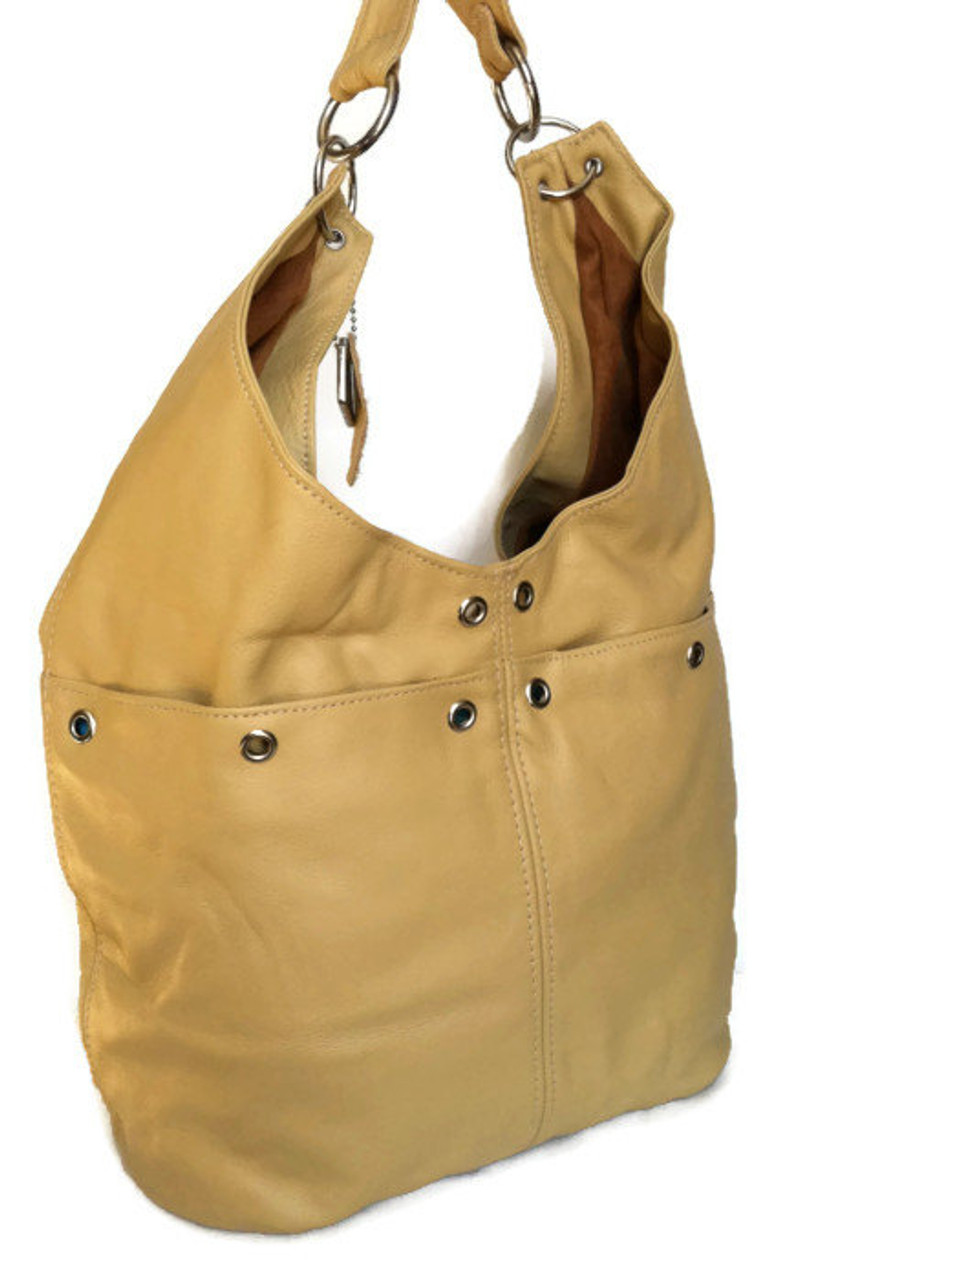 Cream beige leather hobo purse   women shoulder bag   casual bag   casual  handbag kiara - Fgalaze Genuine Leather Bags   Accessories 42a470b12cddb